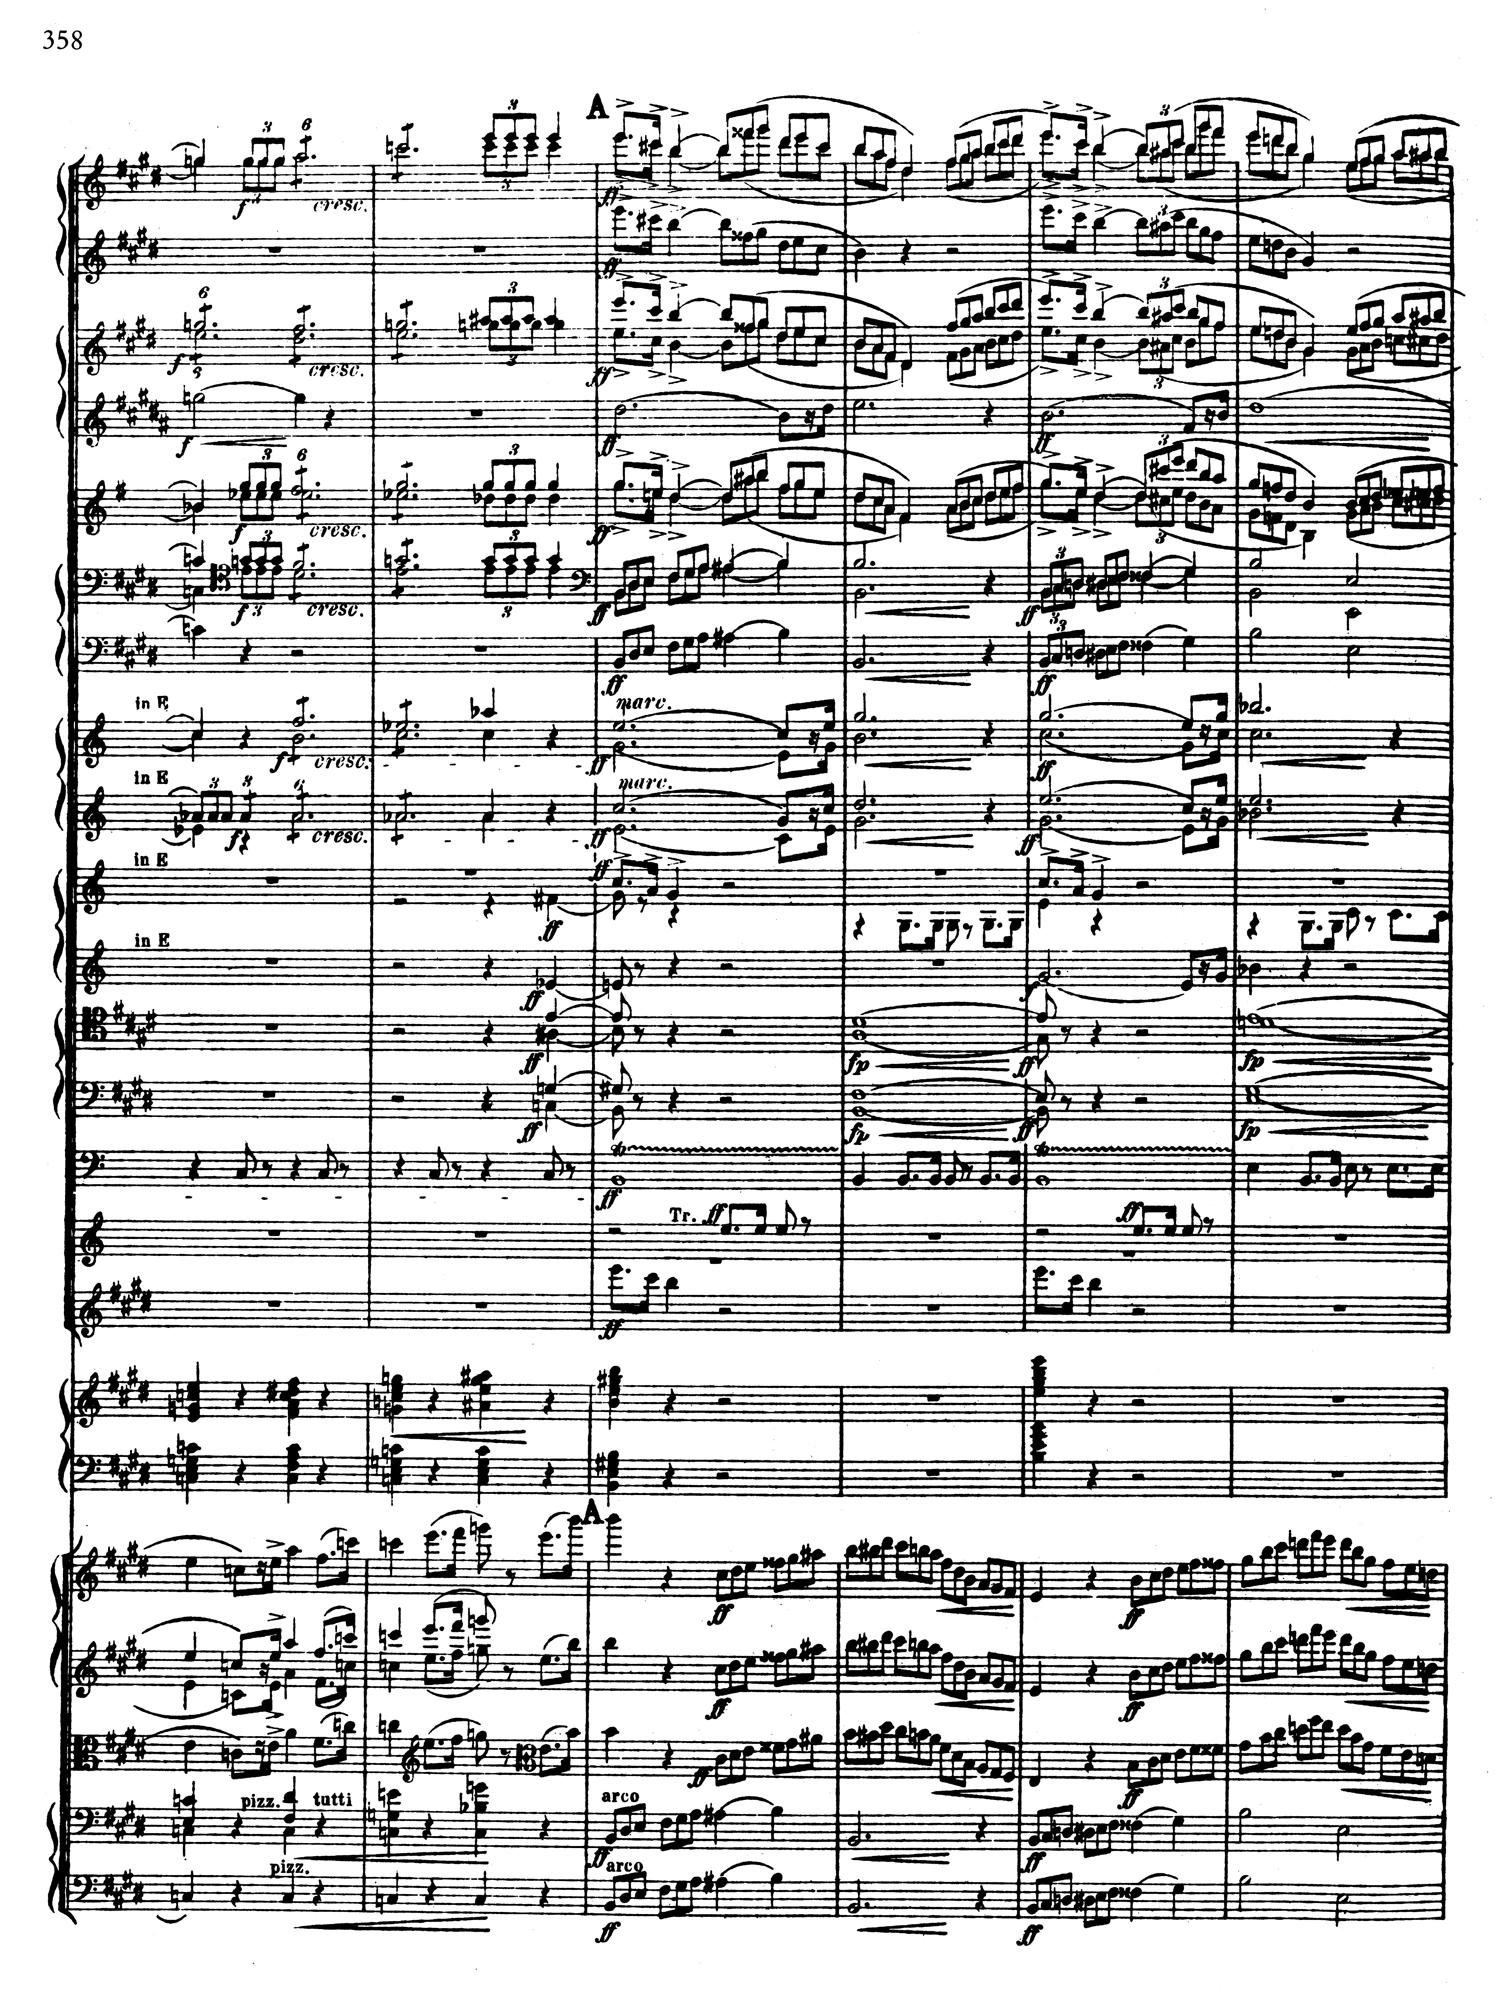 Strauss Don Juan Score 1.jpg